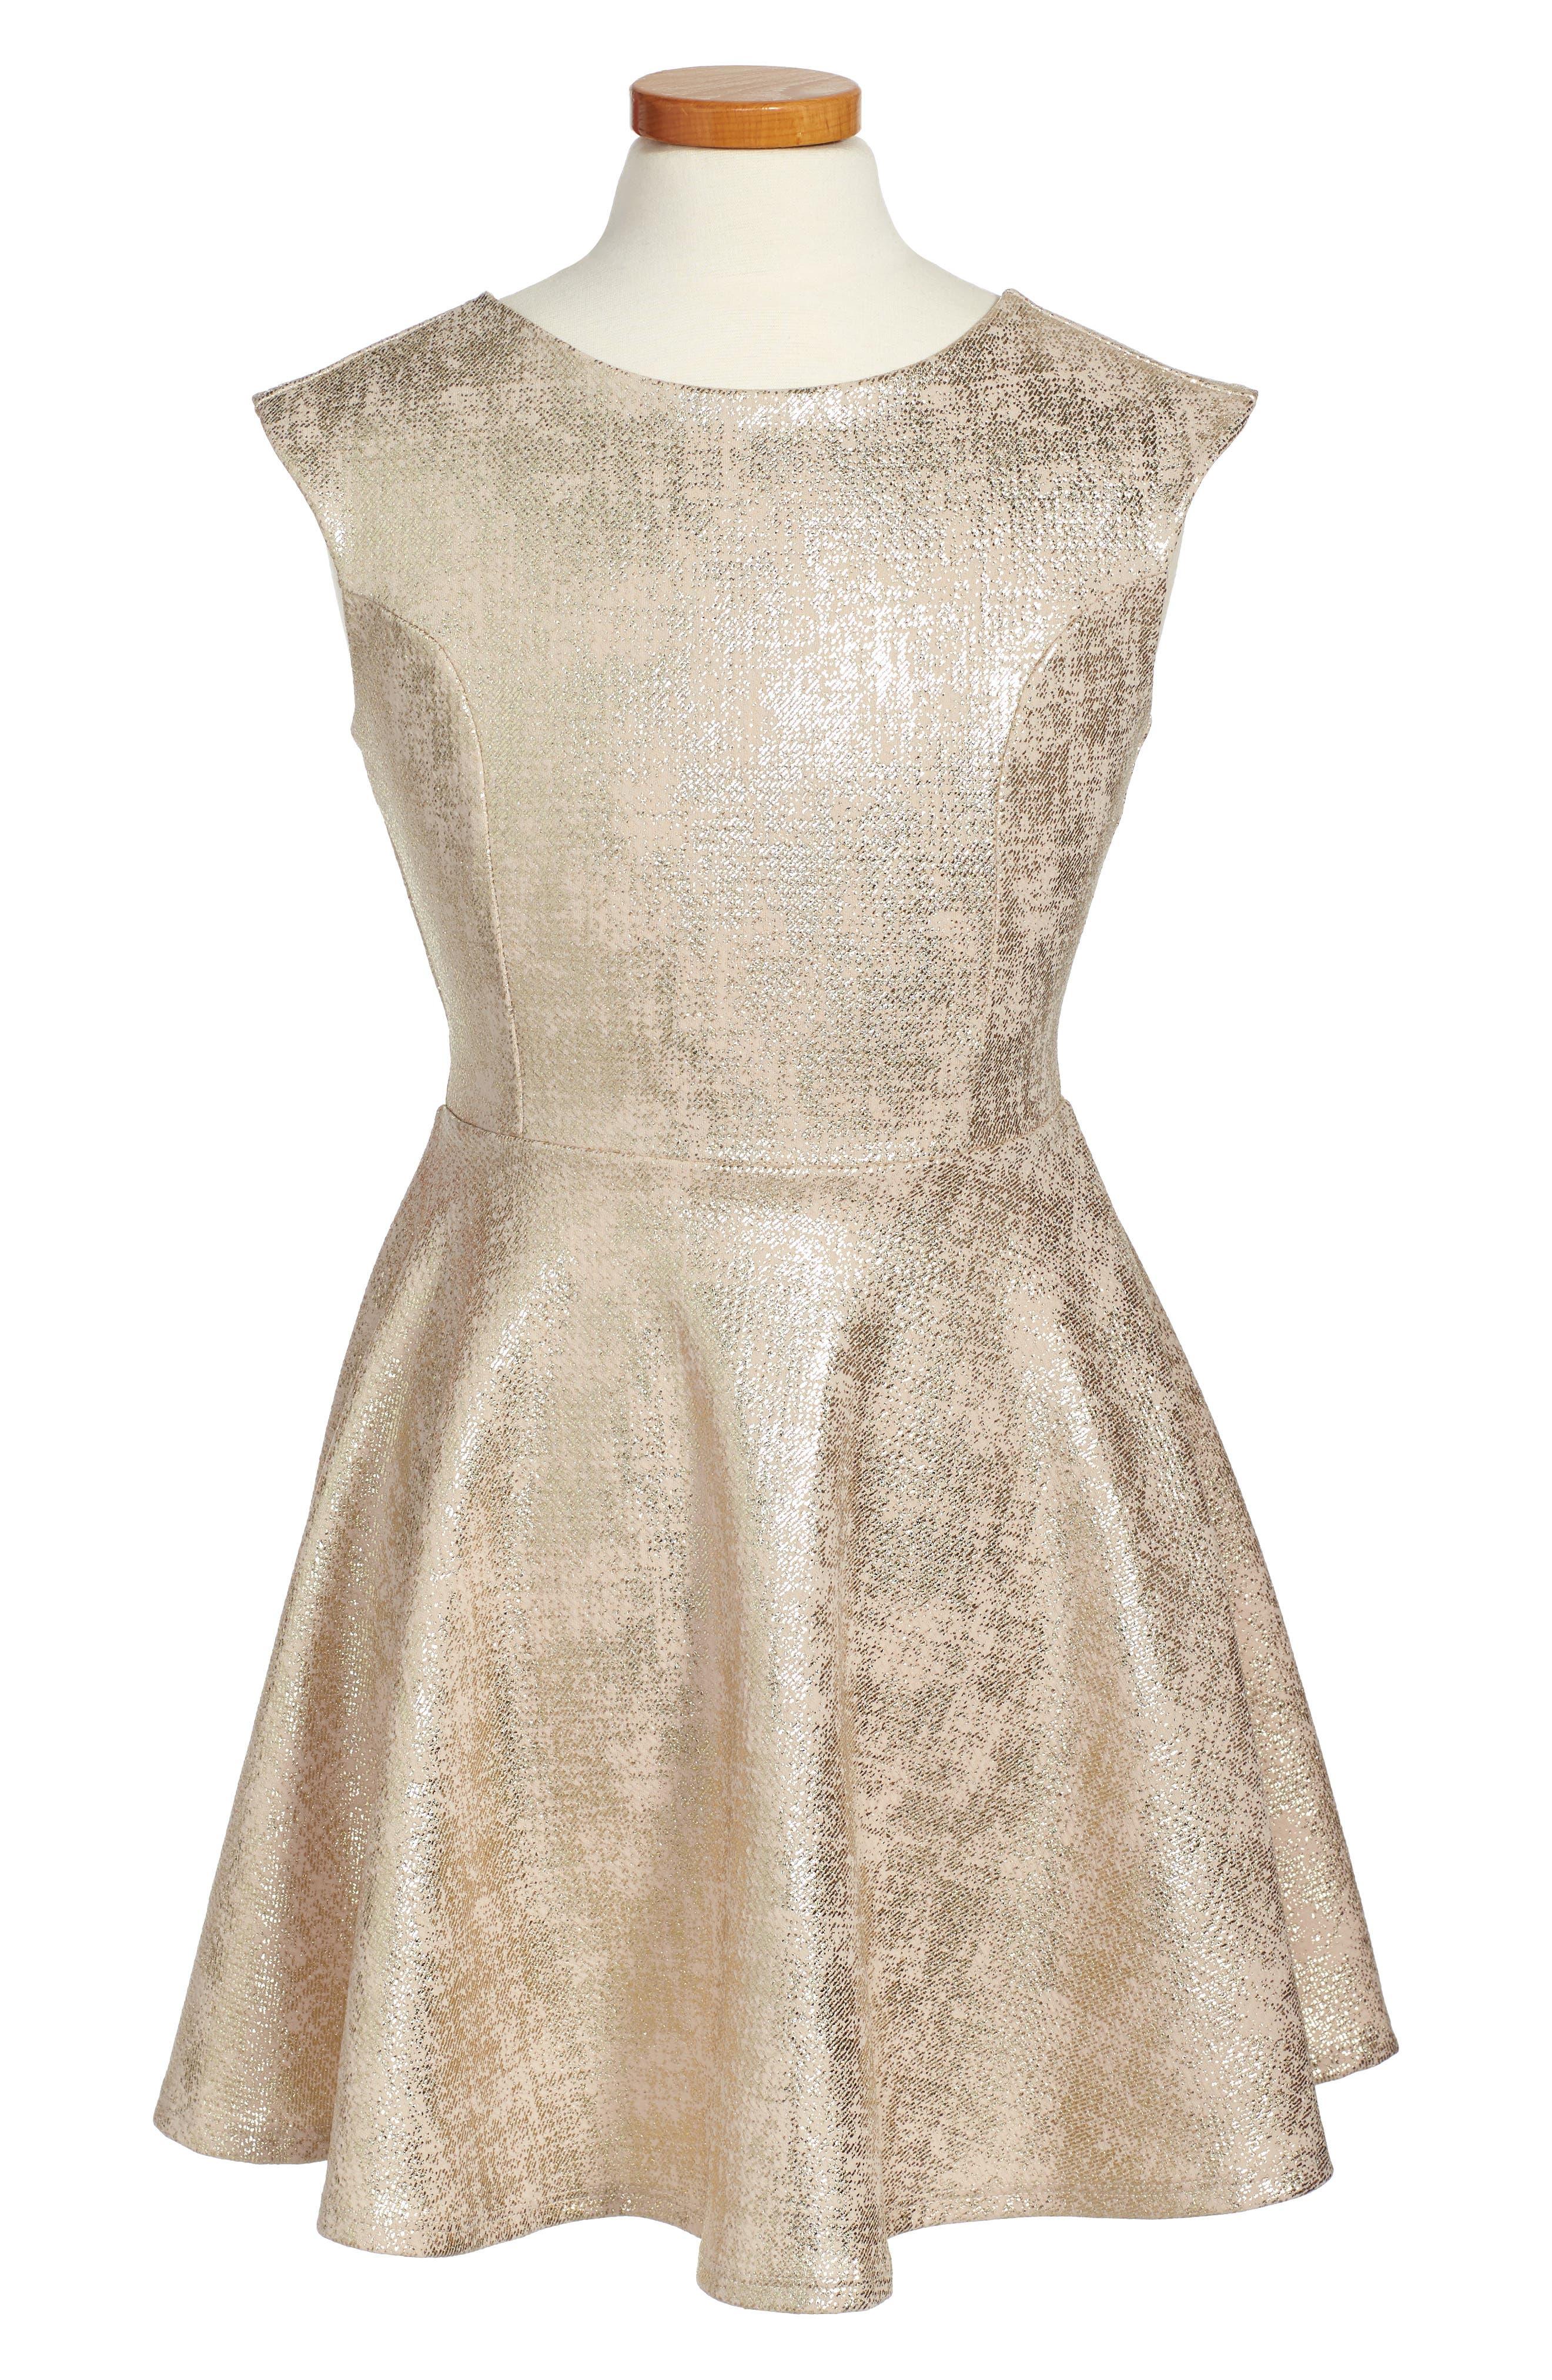 Cap Sleeve Party Dress,                         Main,                         color, 710